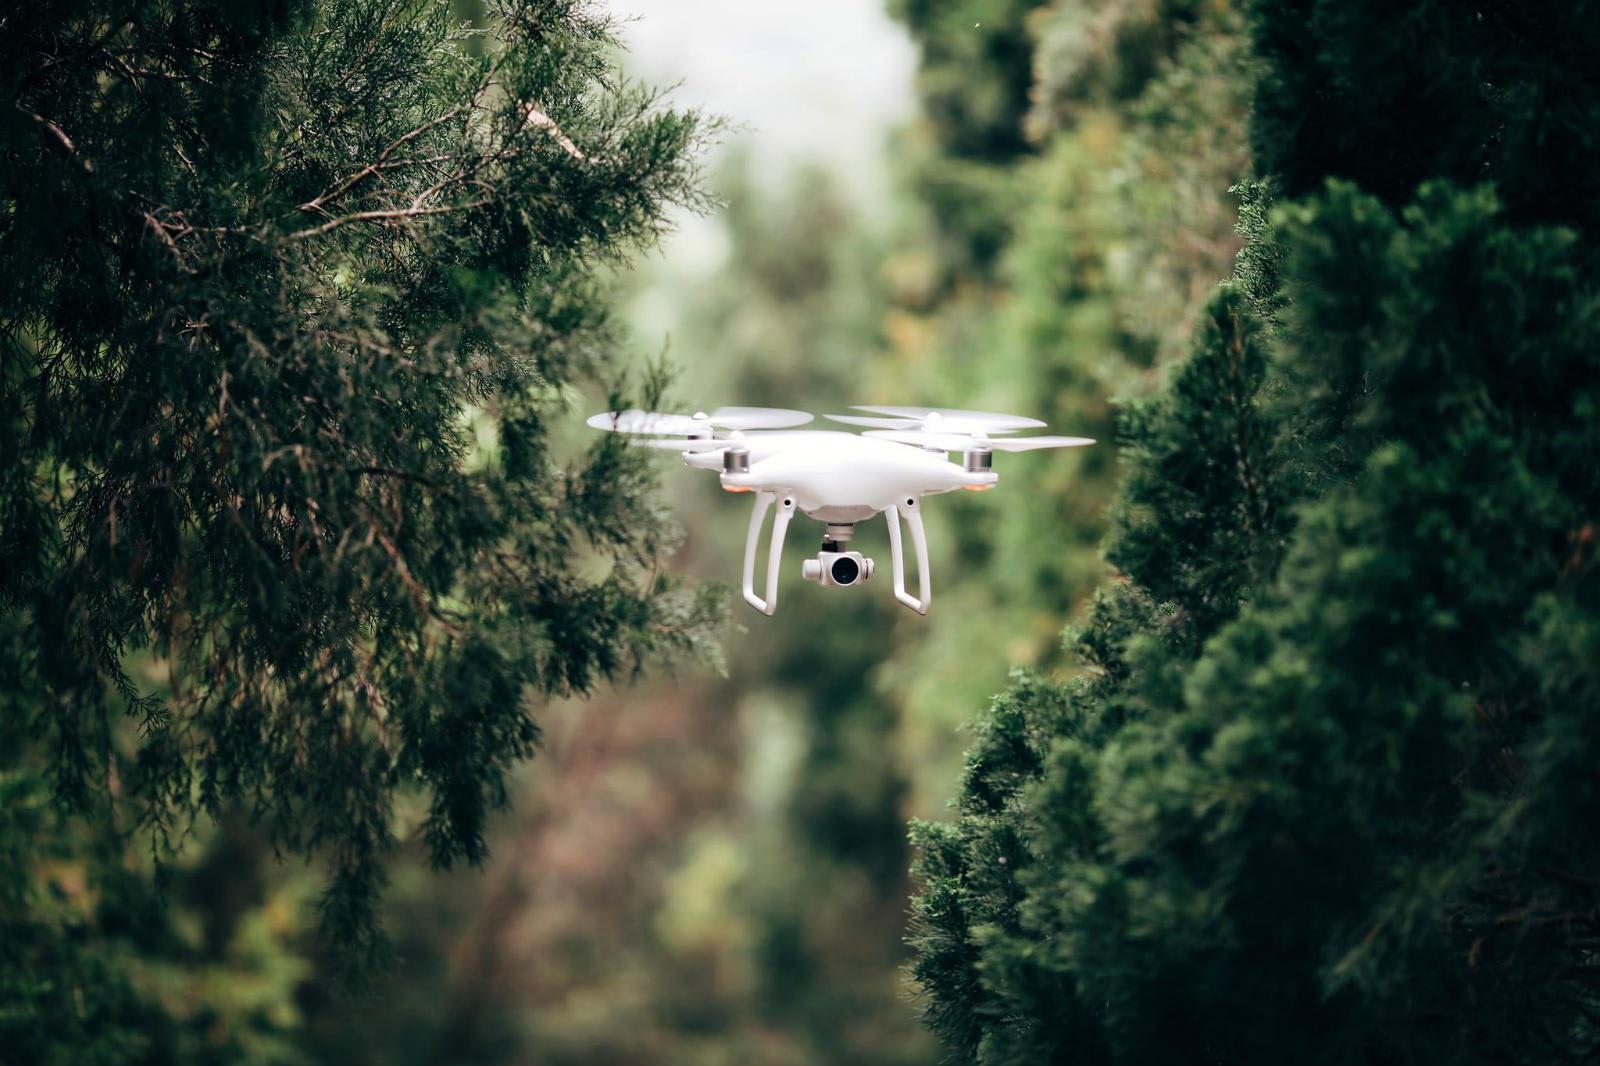 DJI drones are getting an offline mode for secret flights